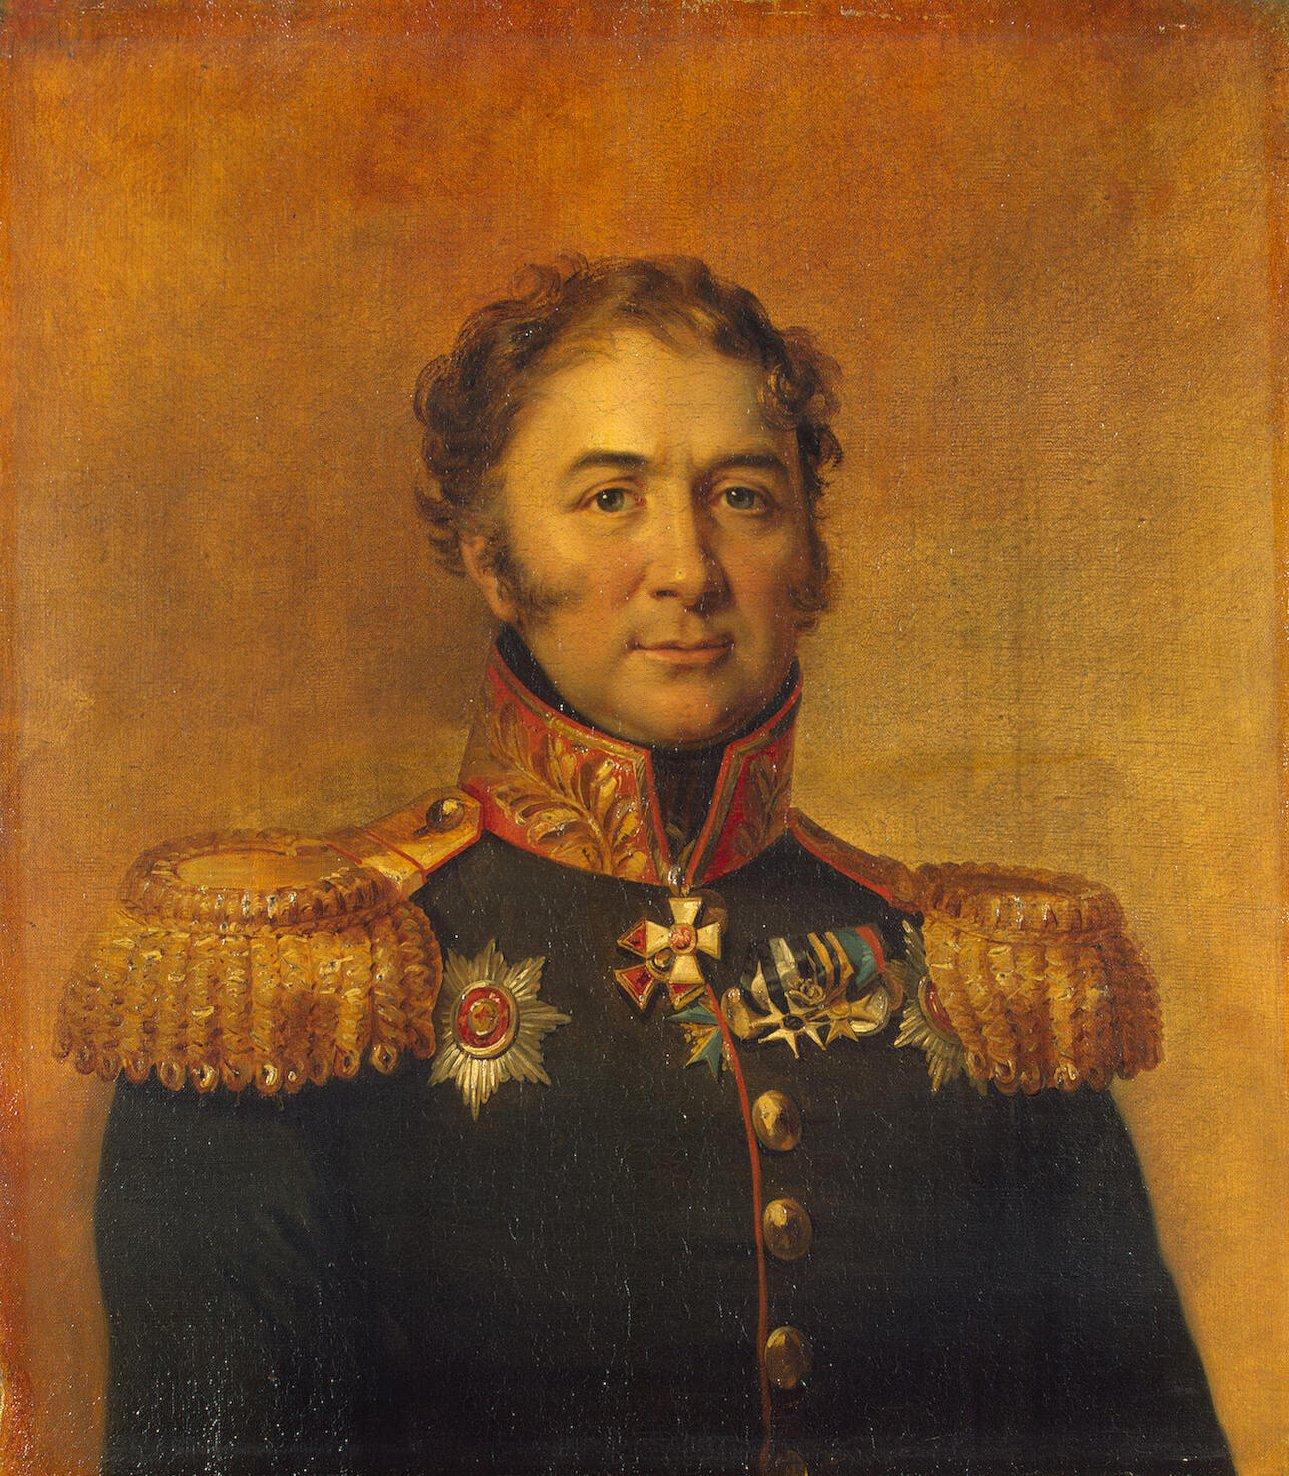 Дехтерев, Николай Васильевич